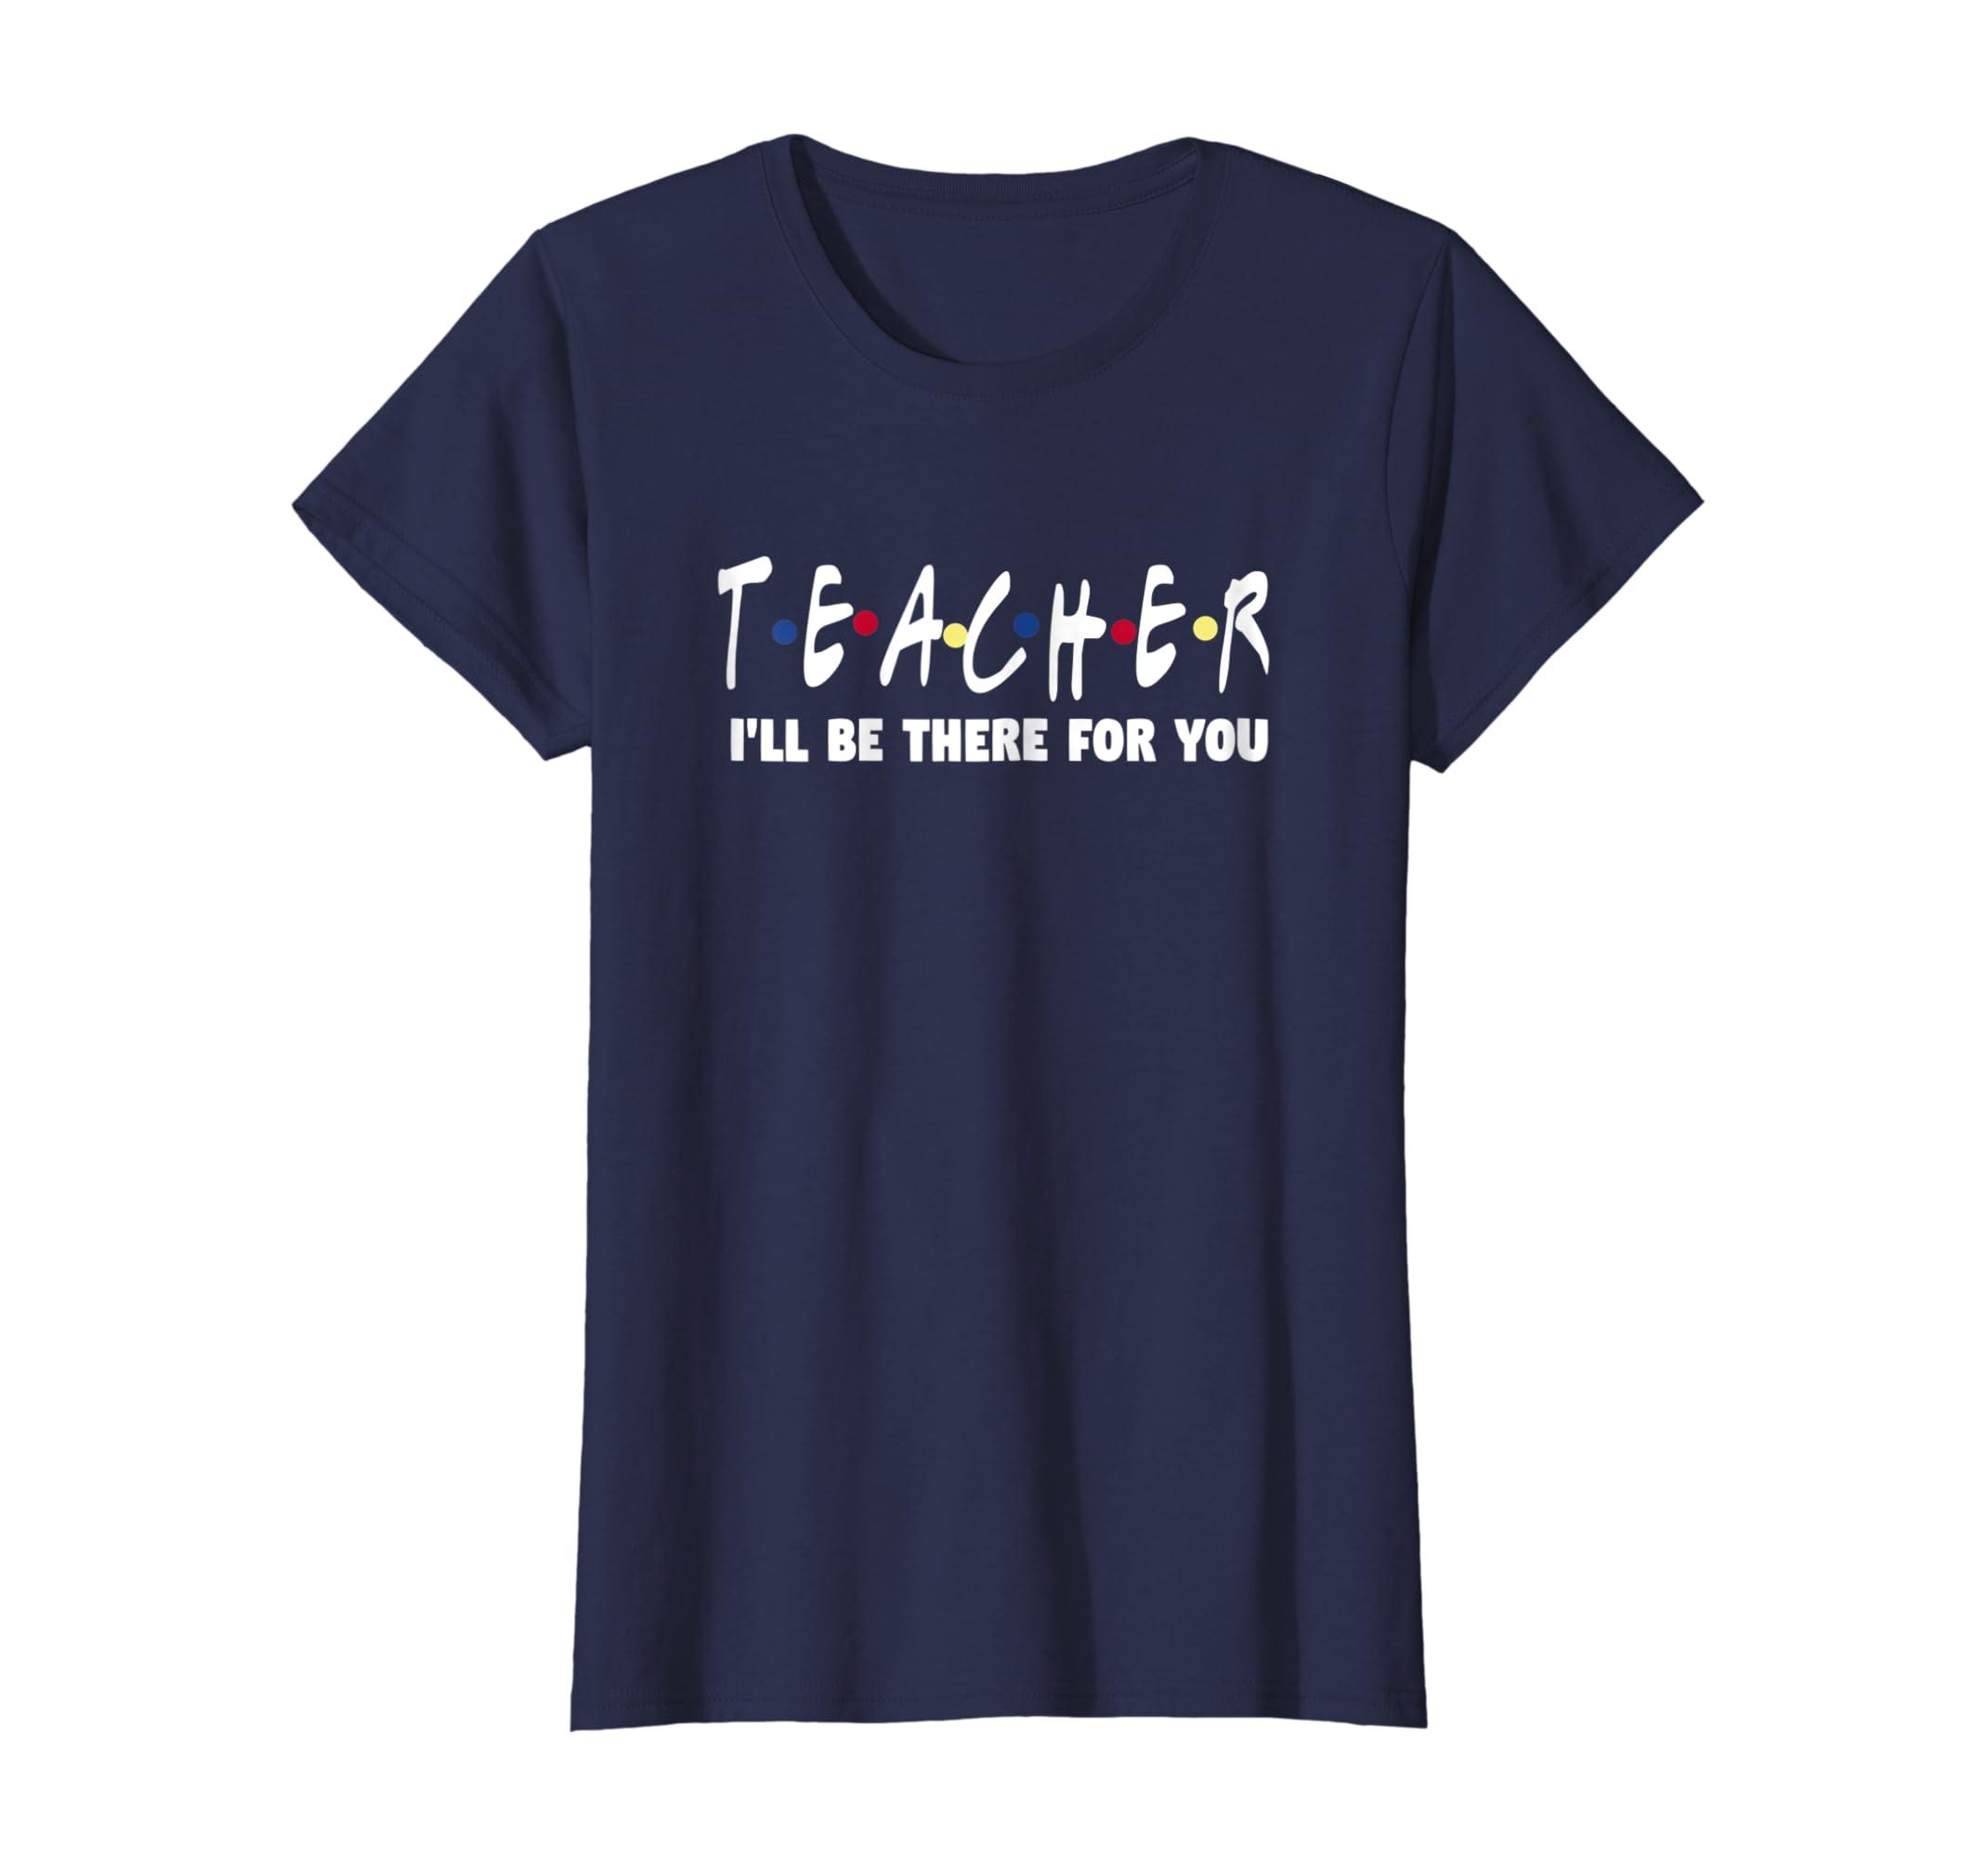 bc5c007d870 Amazon.com  funny friends themed teacher shirt - appreciation gift  Clothing